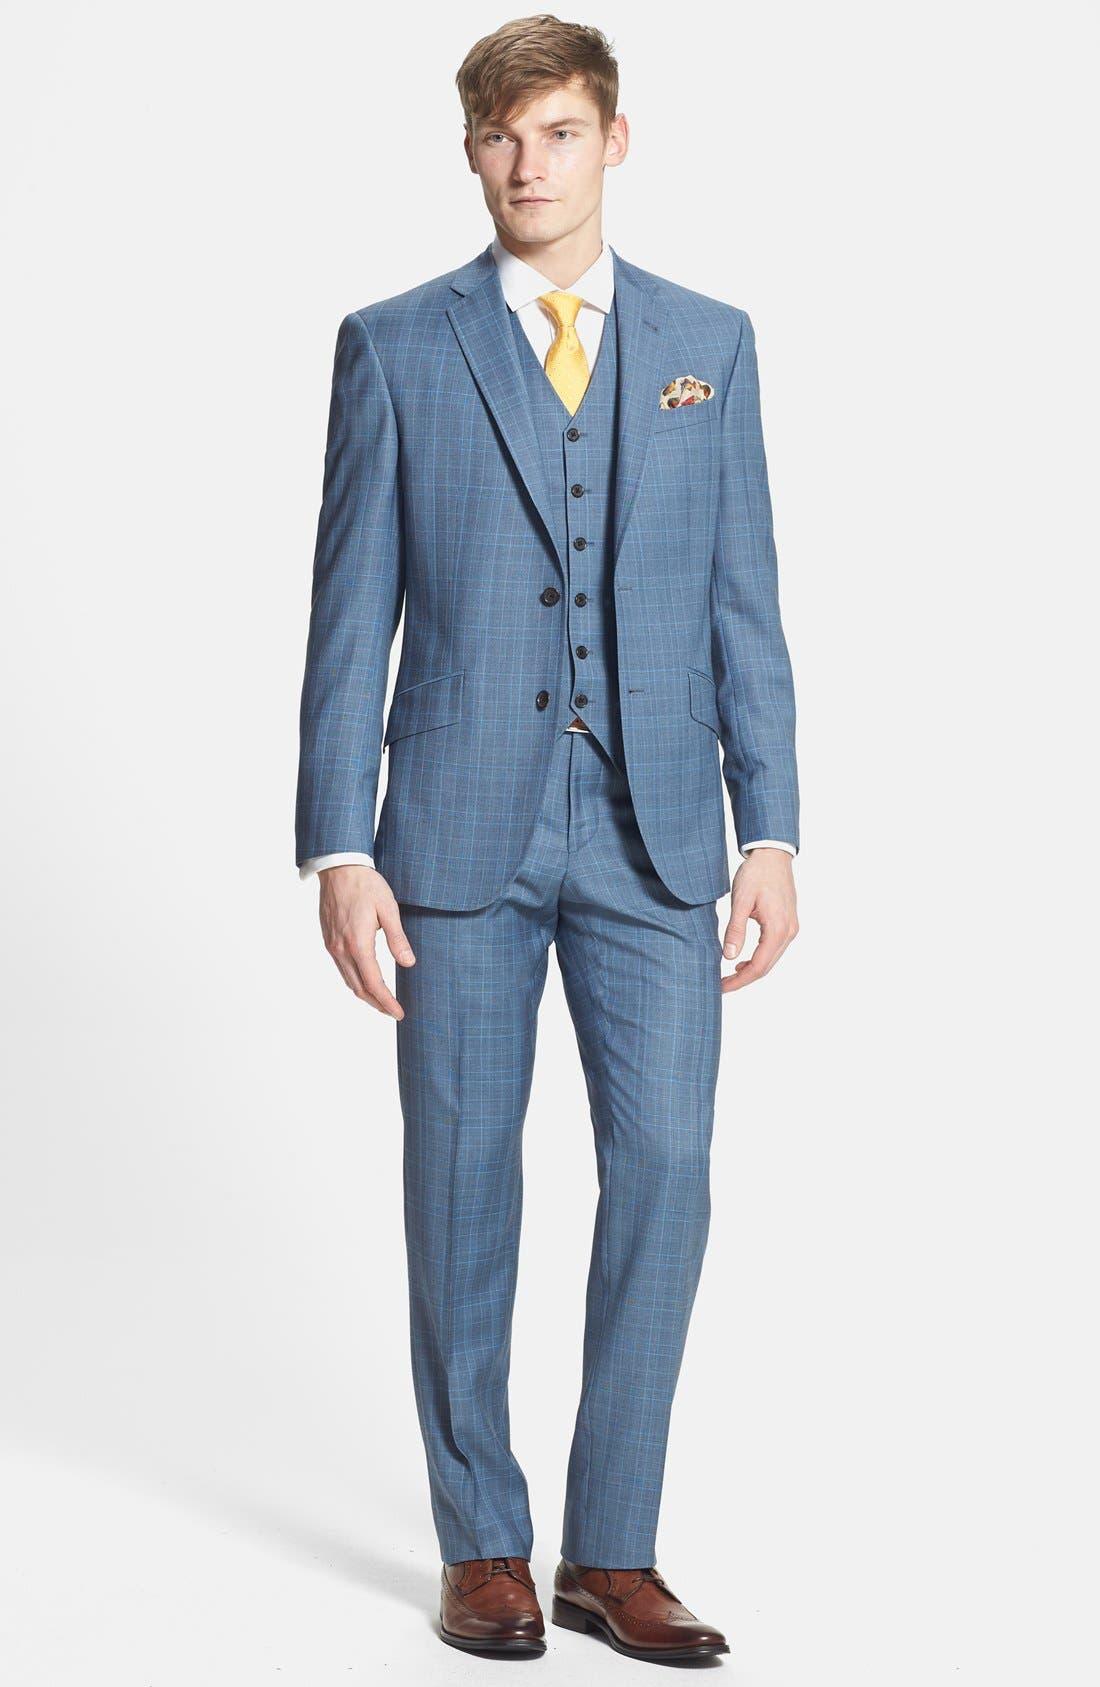 Alternate Image 1 Selected - Ted Baker London 'Jones' Trim Fit Three-Piece Wool Suit